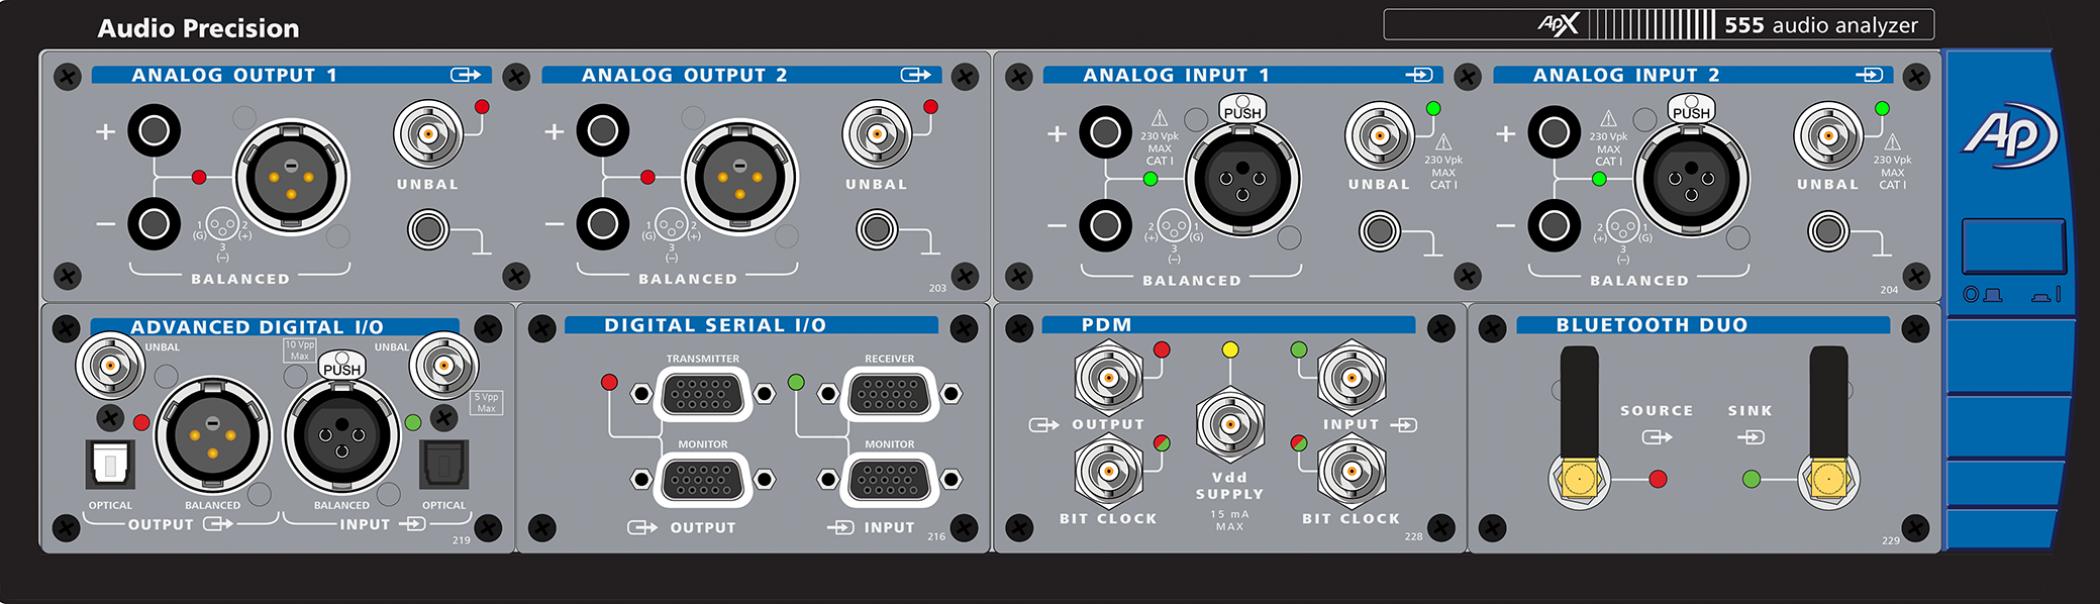 Apx555 Audio Analyzer Precision Distortion Meter